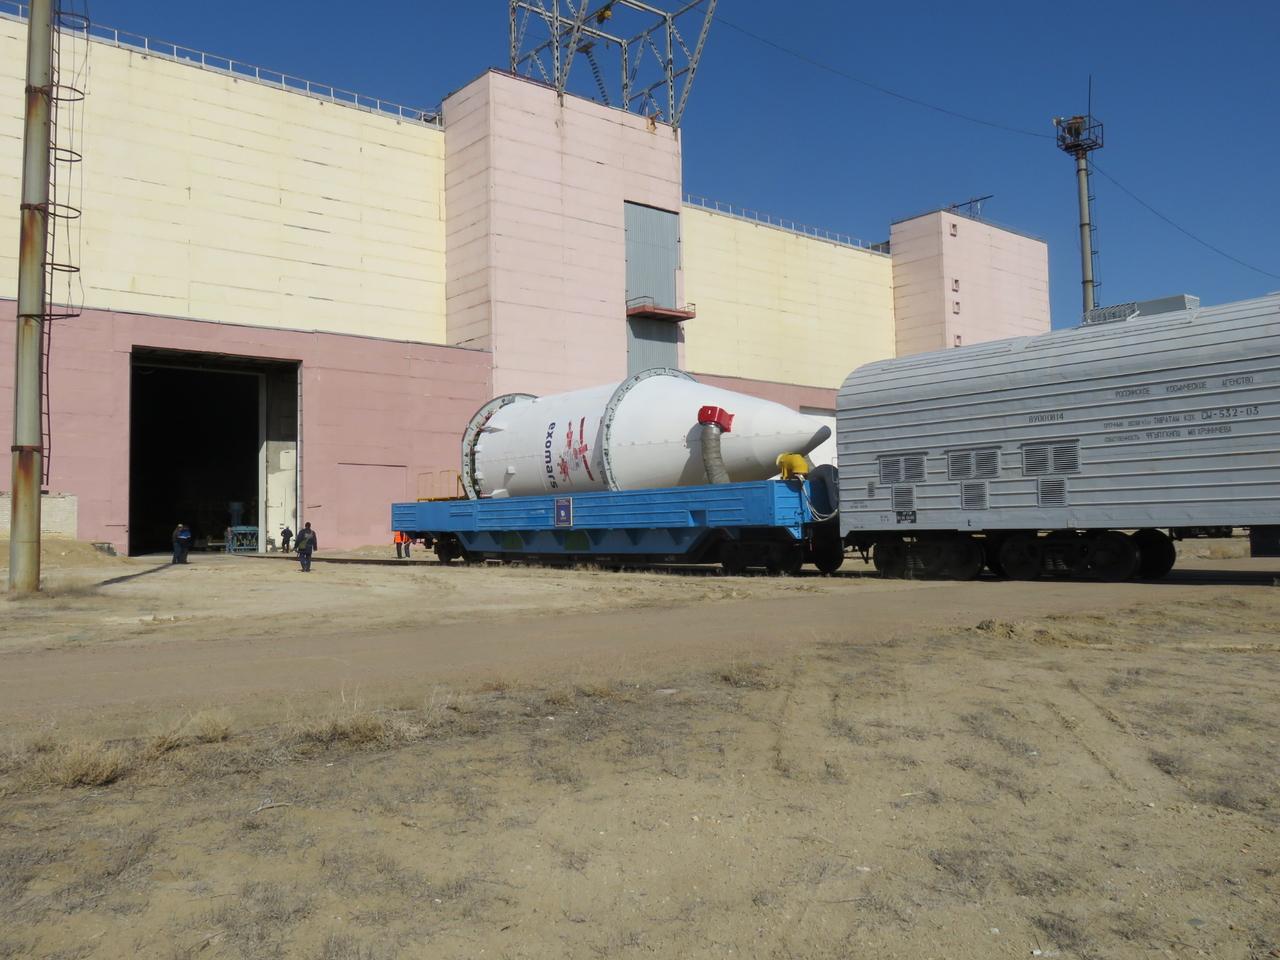 ExoMars Spacecraft at Baikonur